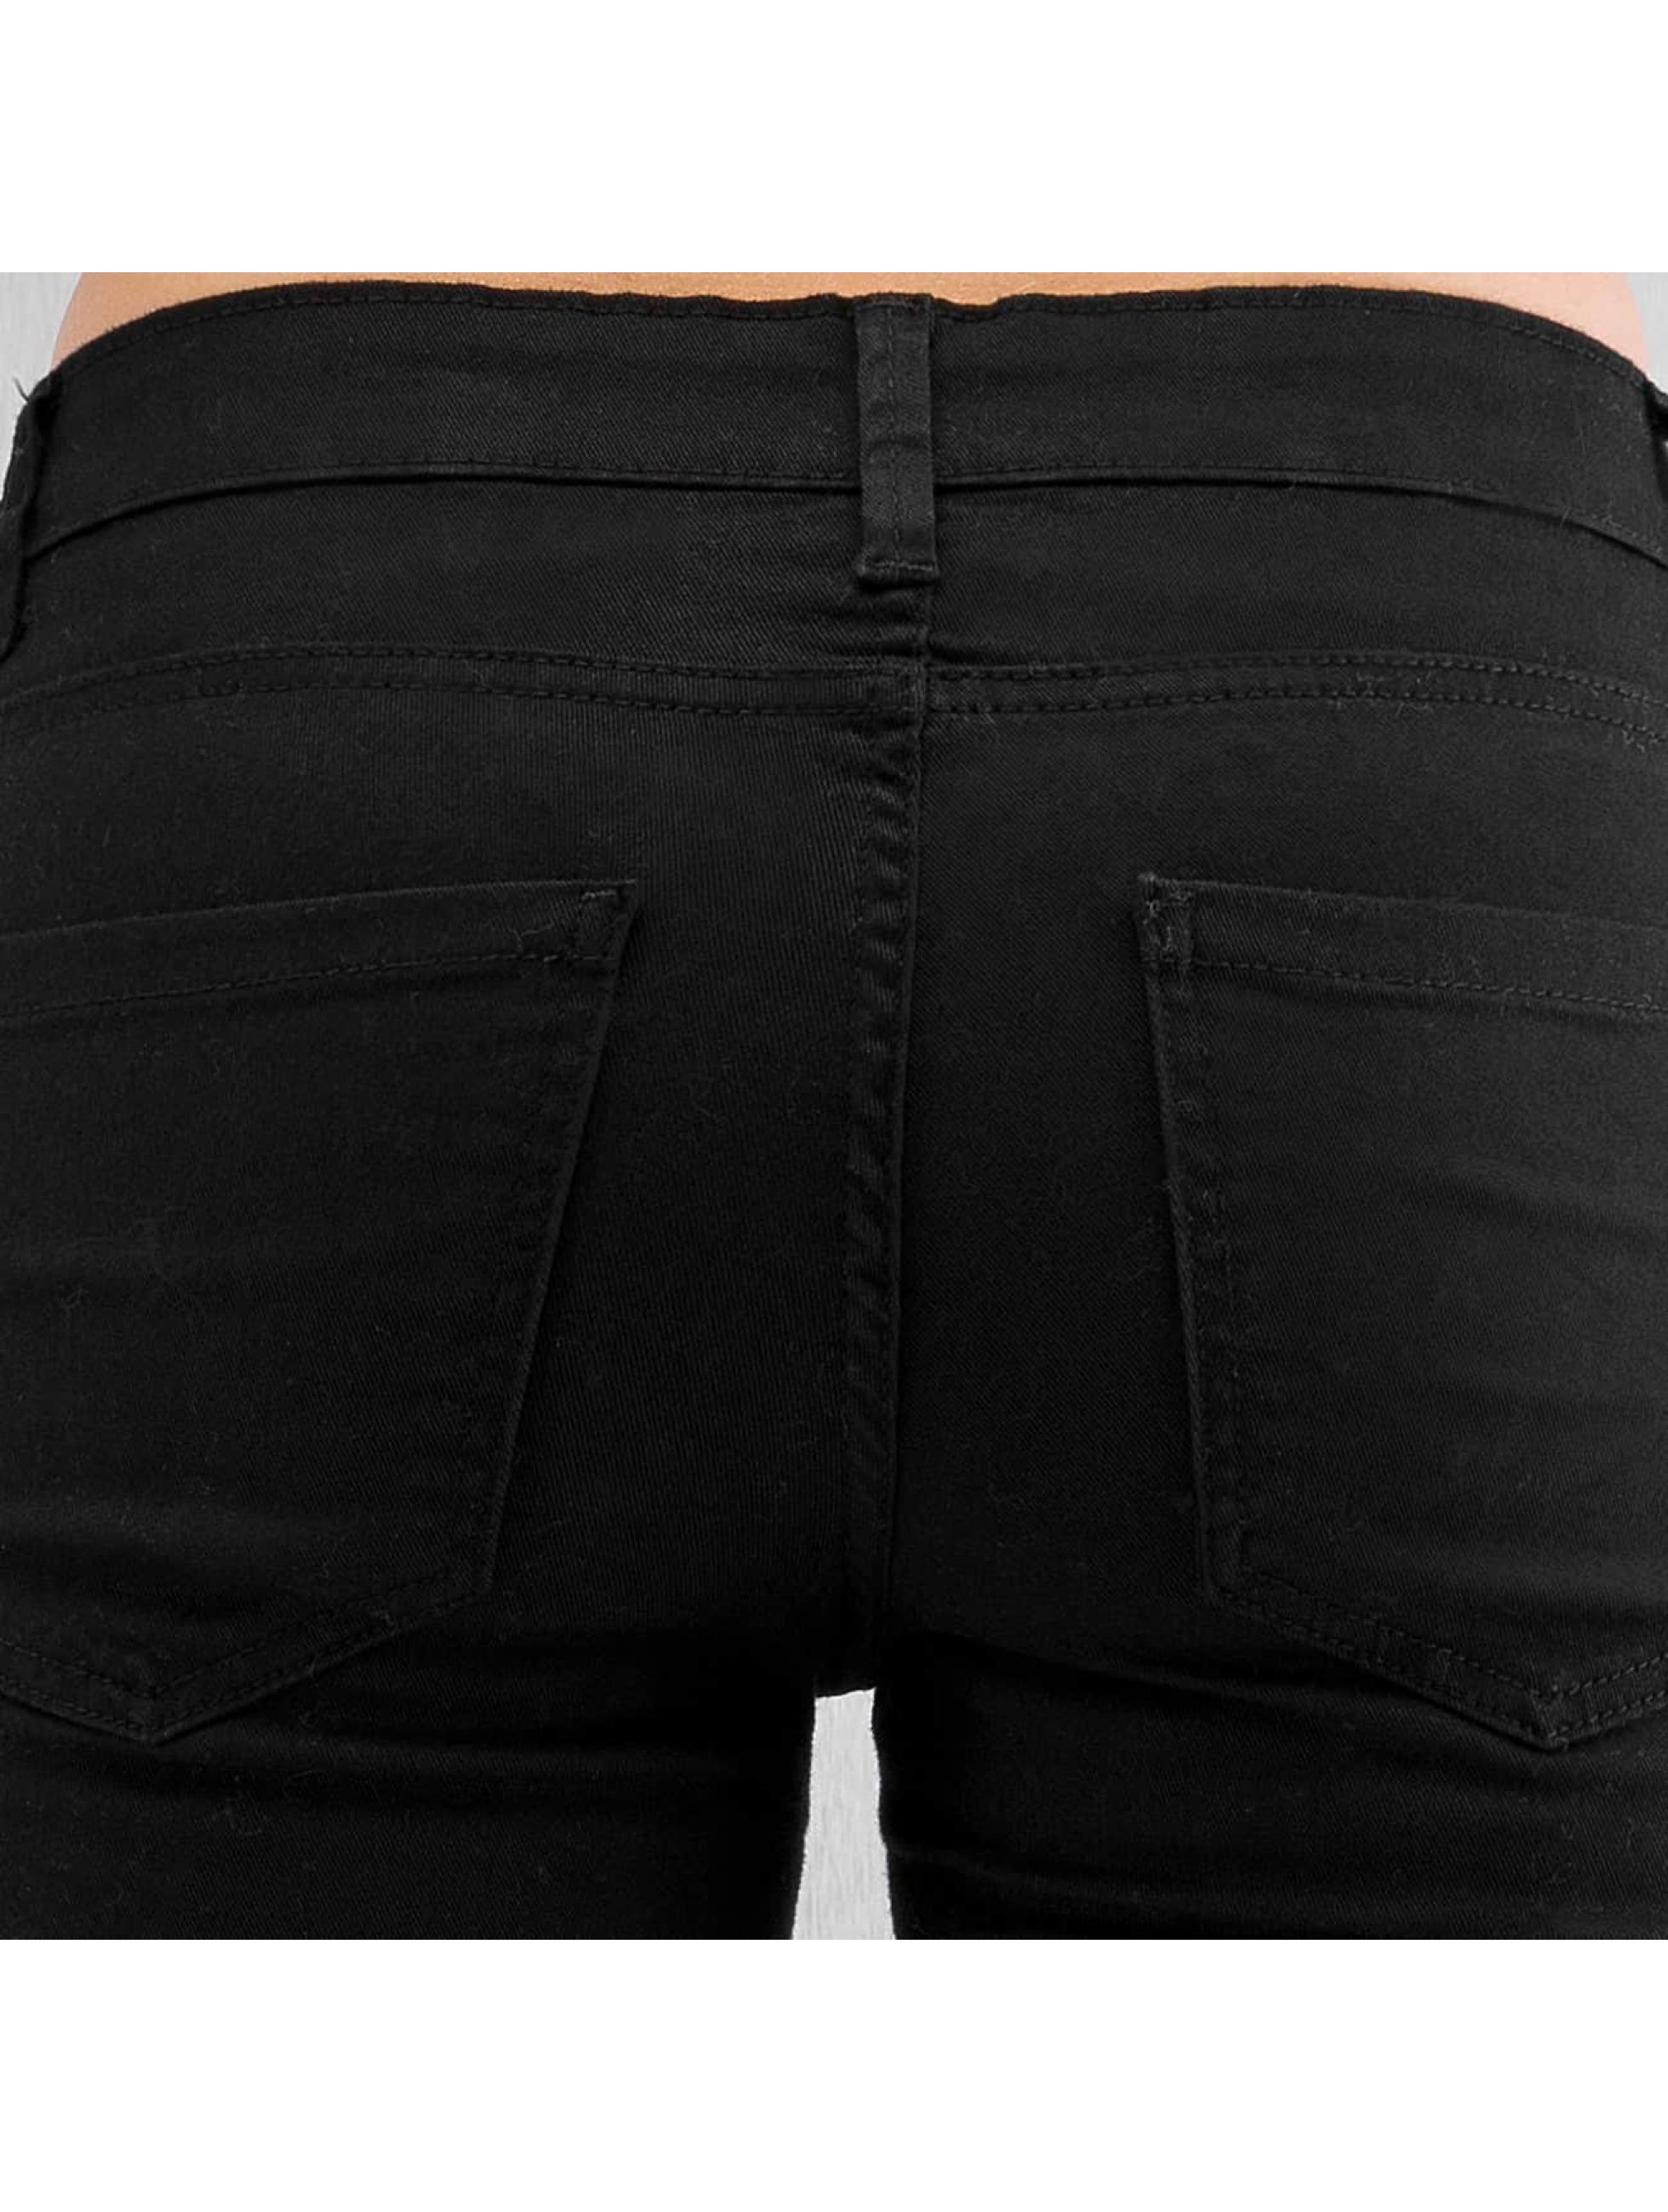 Urban Classics Skinny jeans Ladies zwart